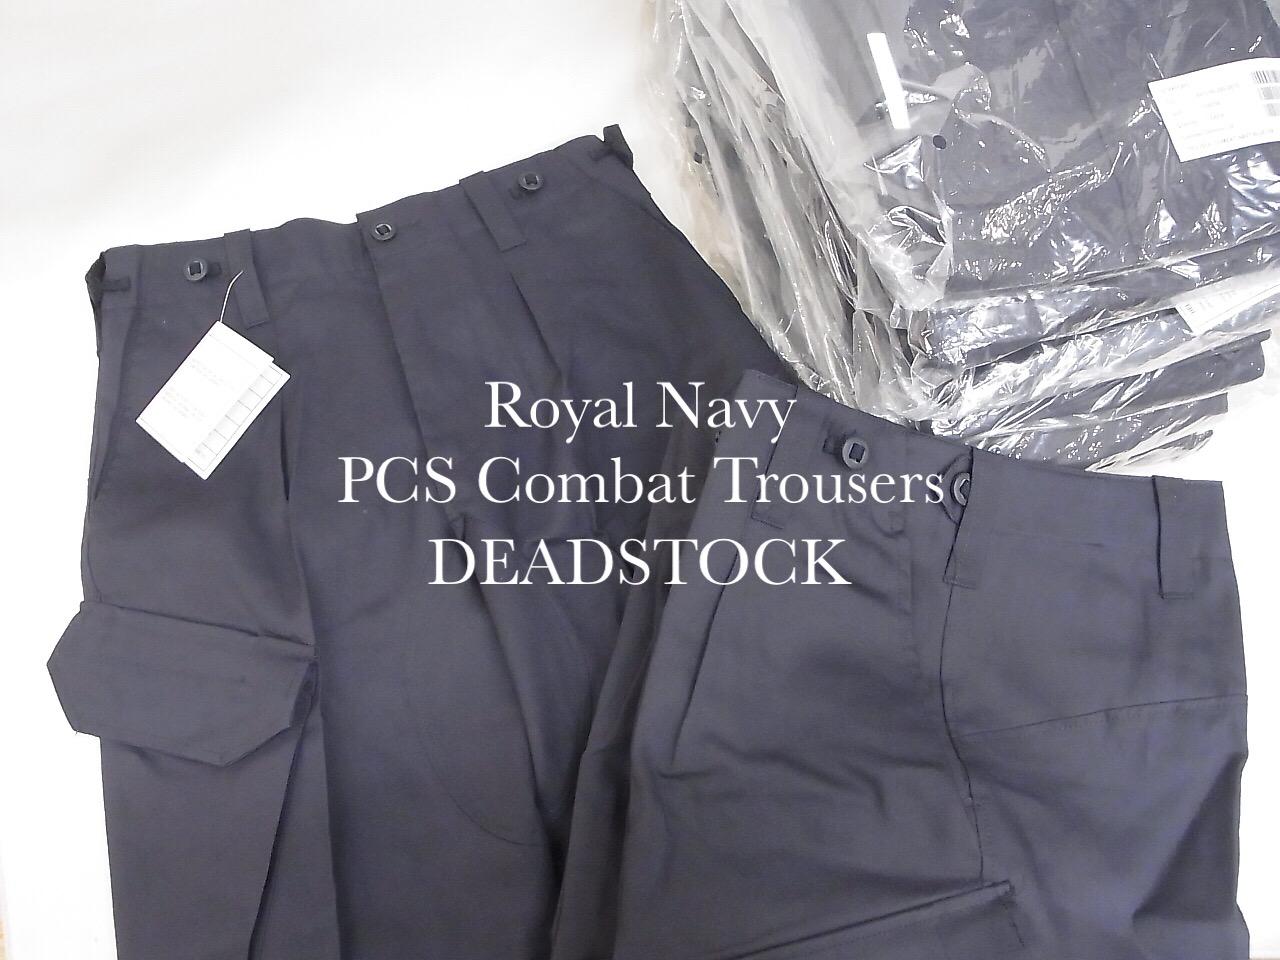 royalnavy-pcs-combattrousers-20211013-1